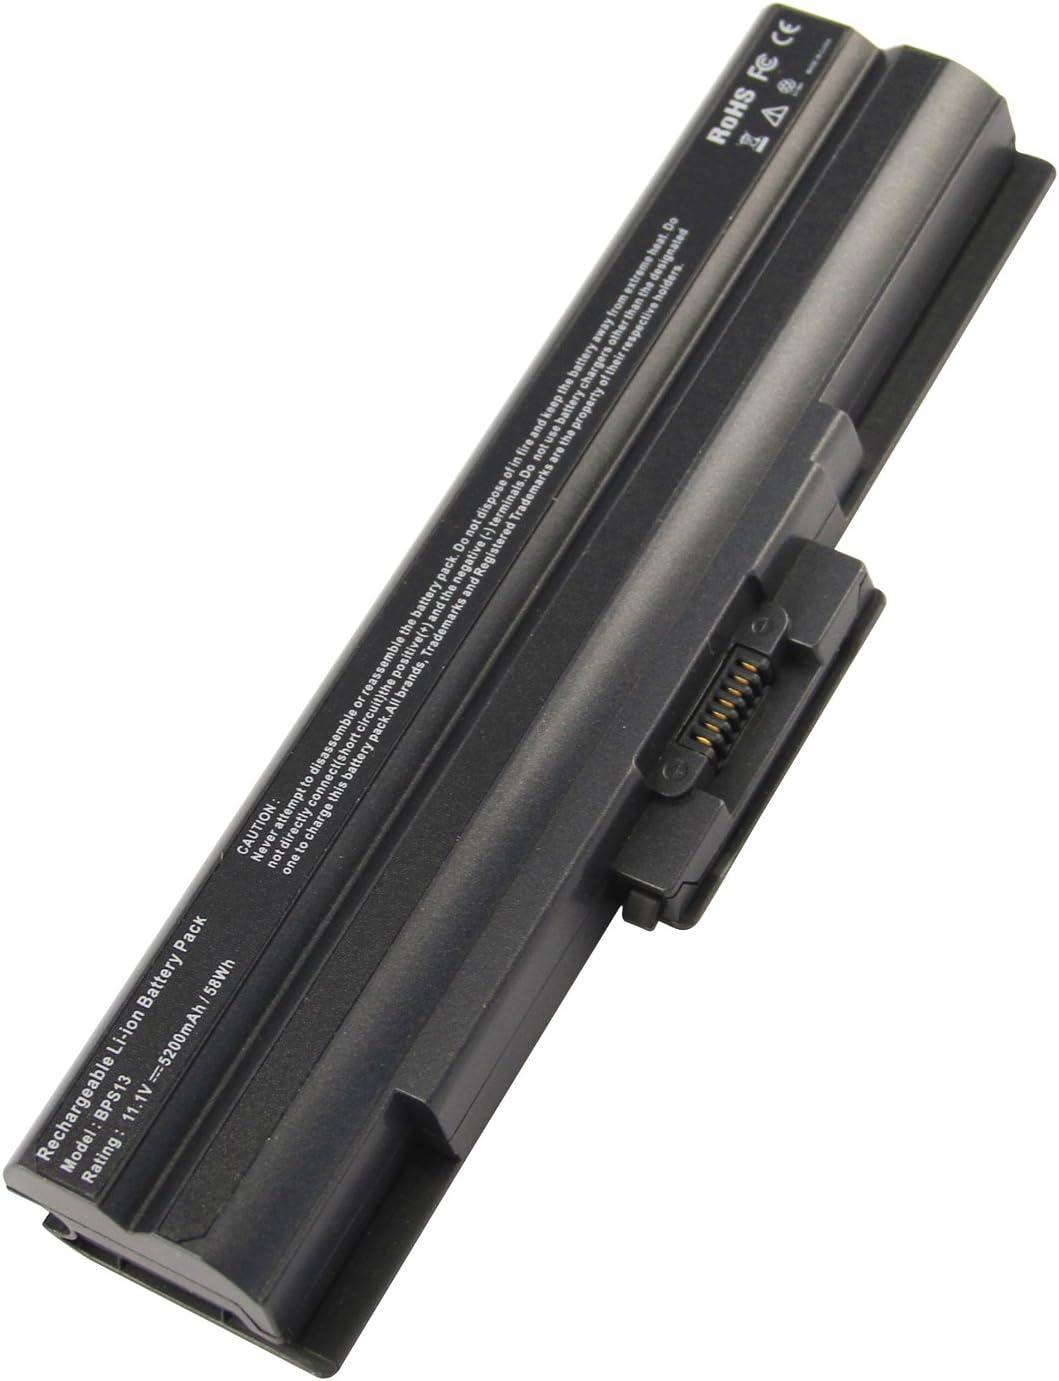 Futurebatt 5200mAh Laptop Battery for Direct sale of manufacturer Vaio VPC Sony VGP-B Series Outlet SALE